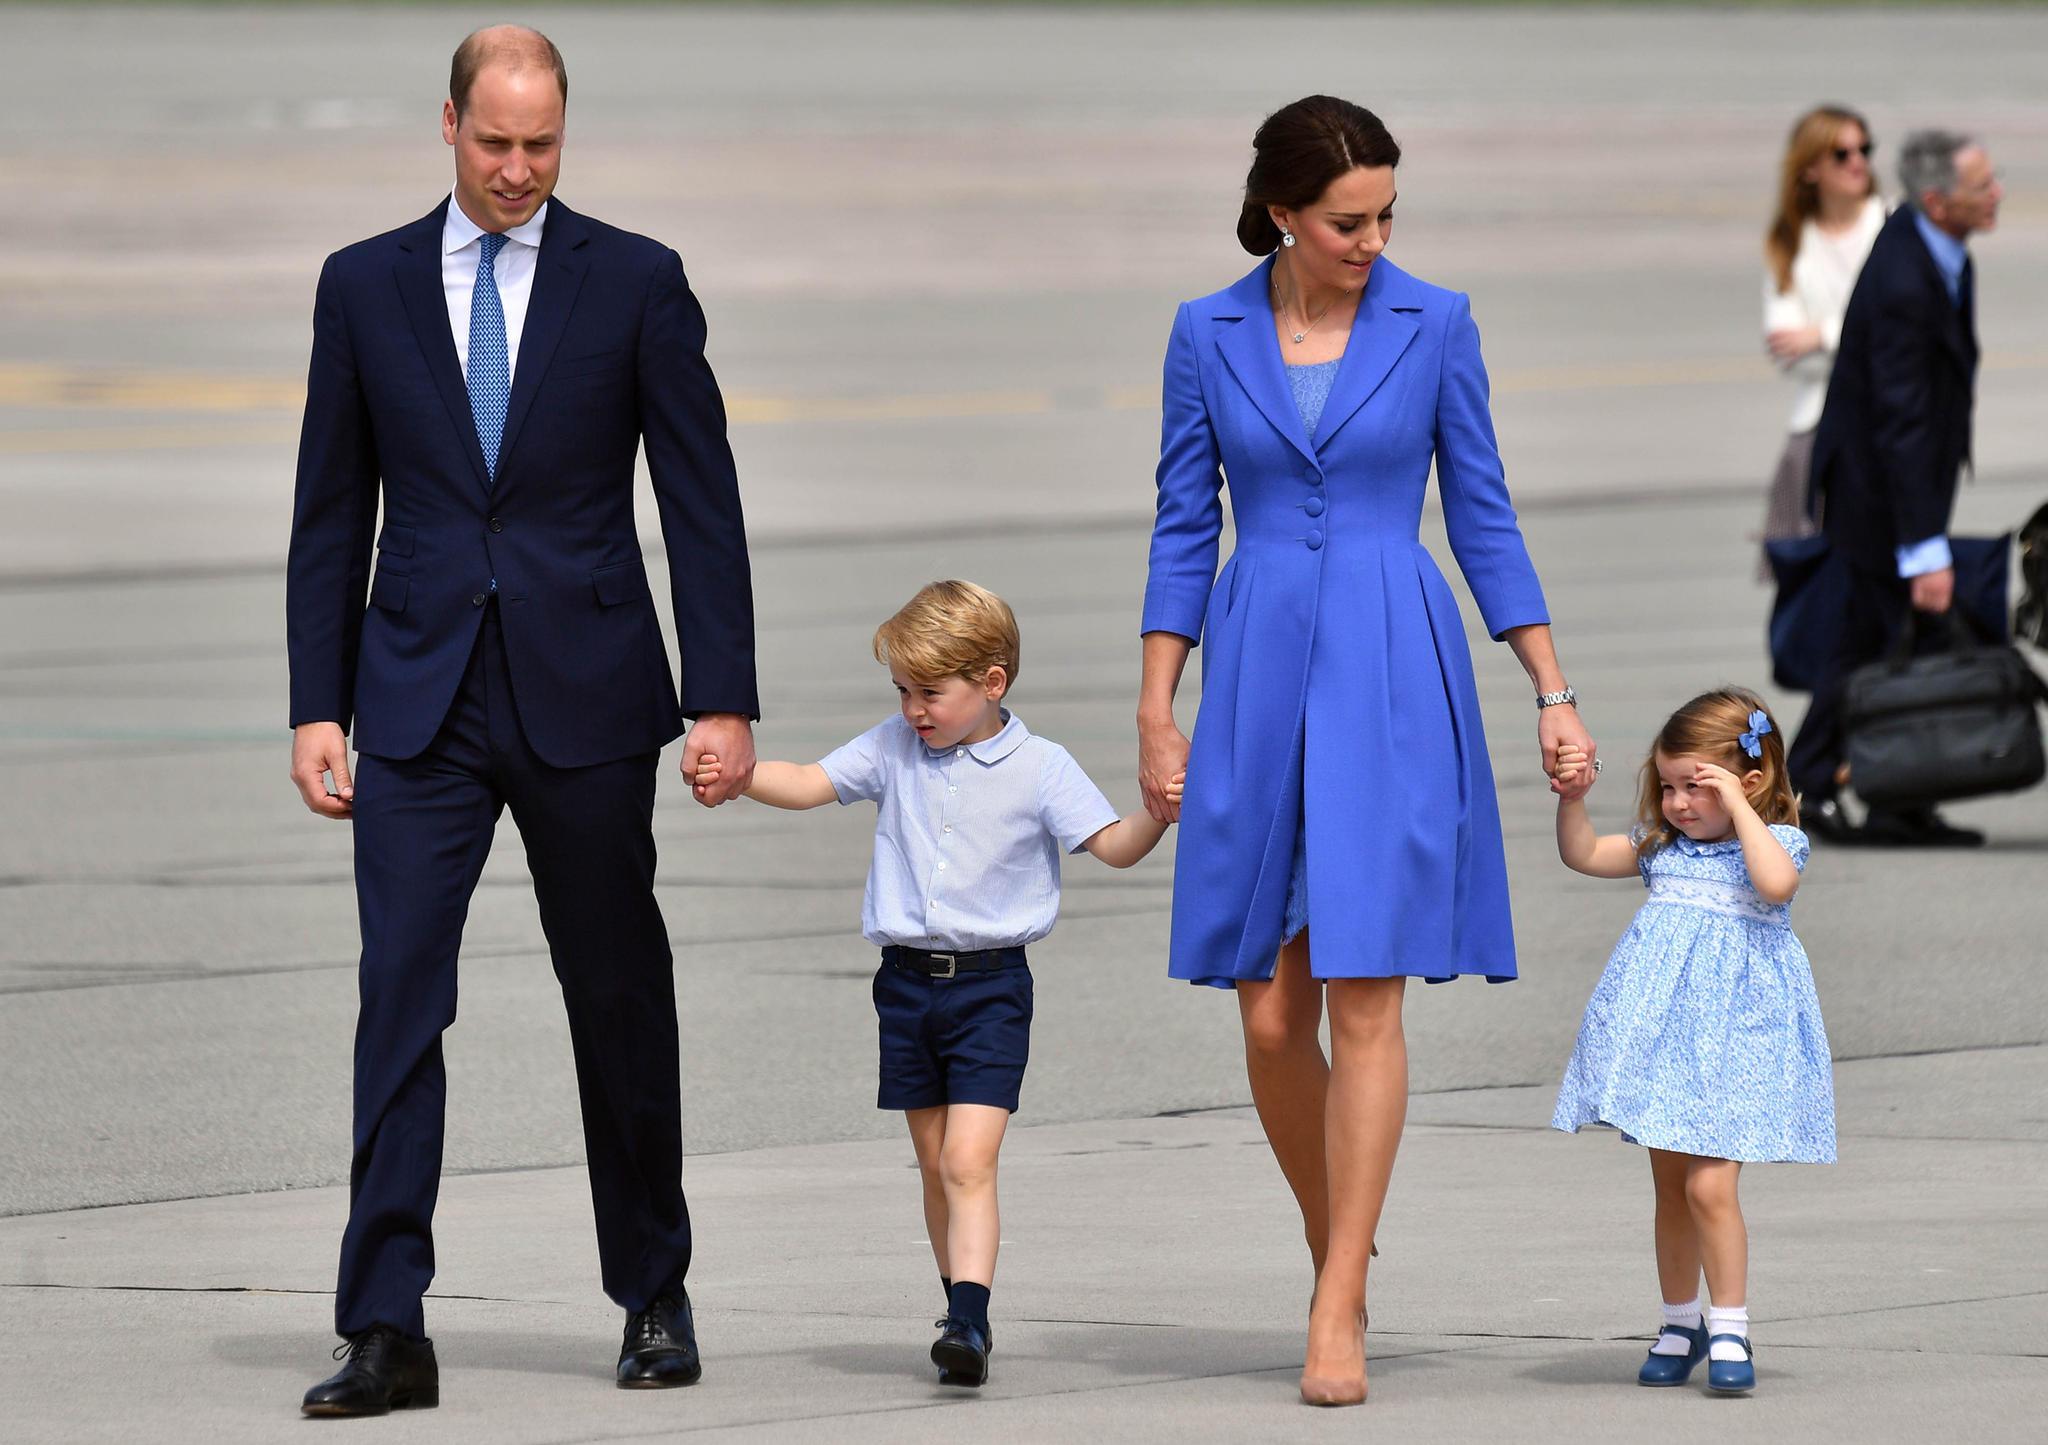 Prinz William Plaudert Erwartet Herzogin Catherine Zwillinge Galade